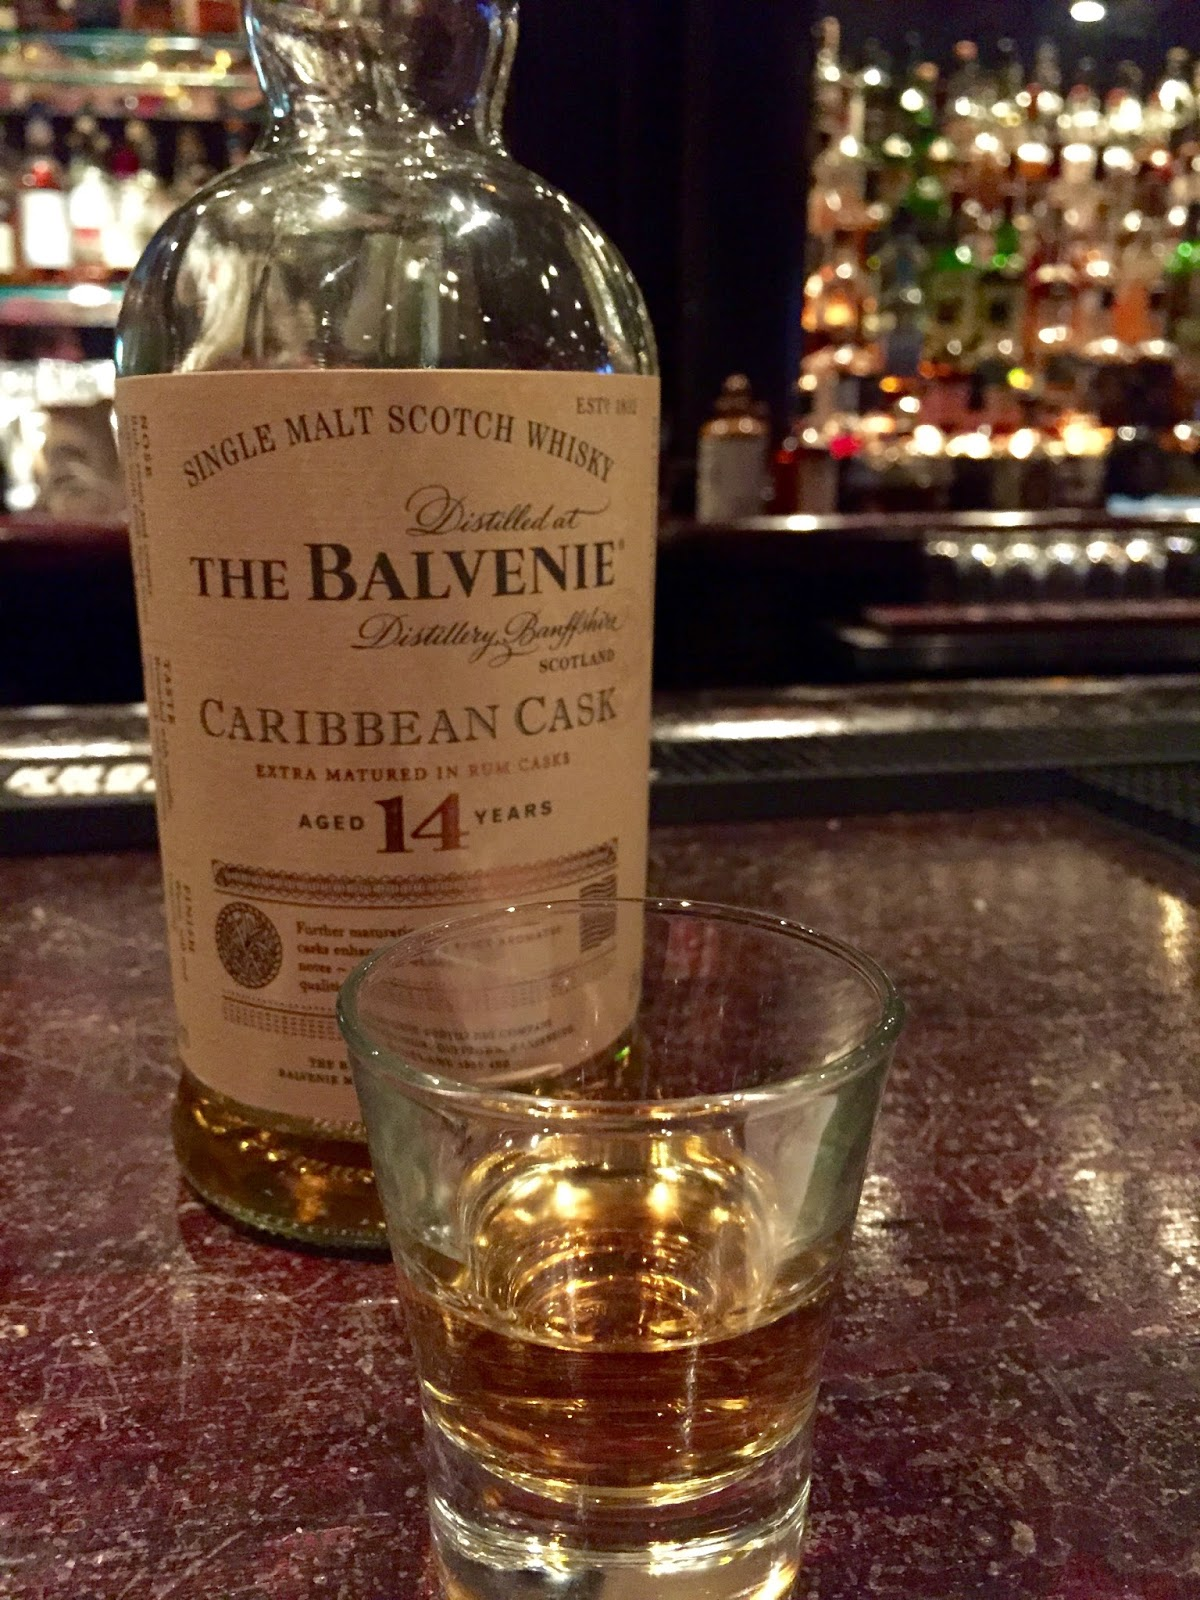 The Balvenie 14 Caribbean Cask